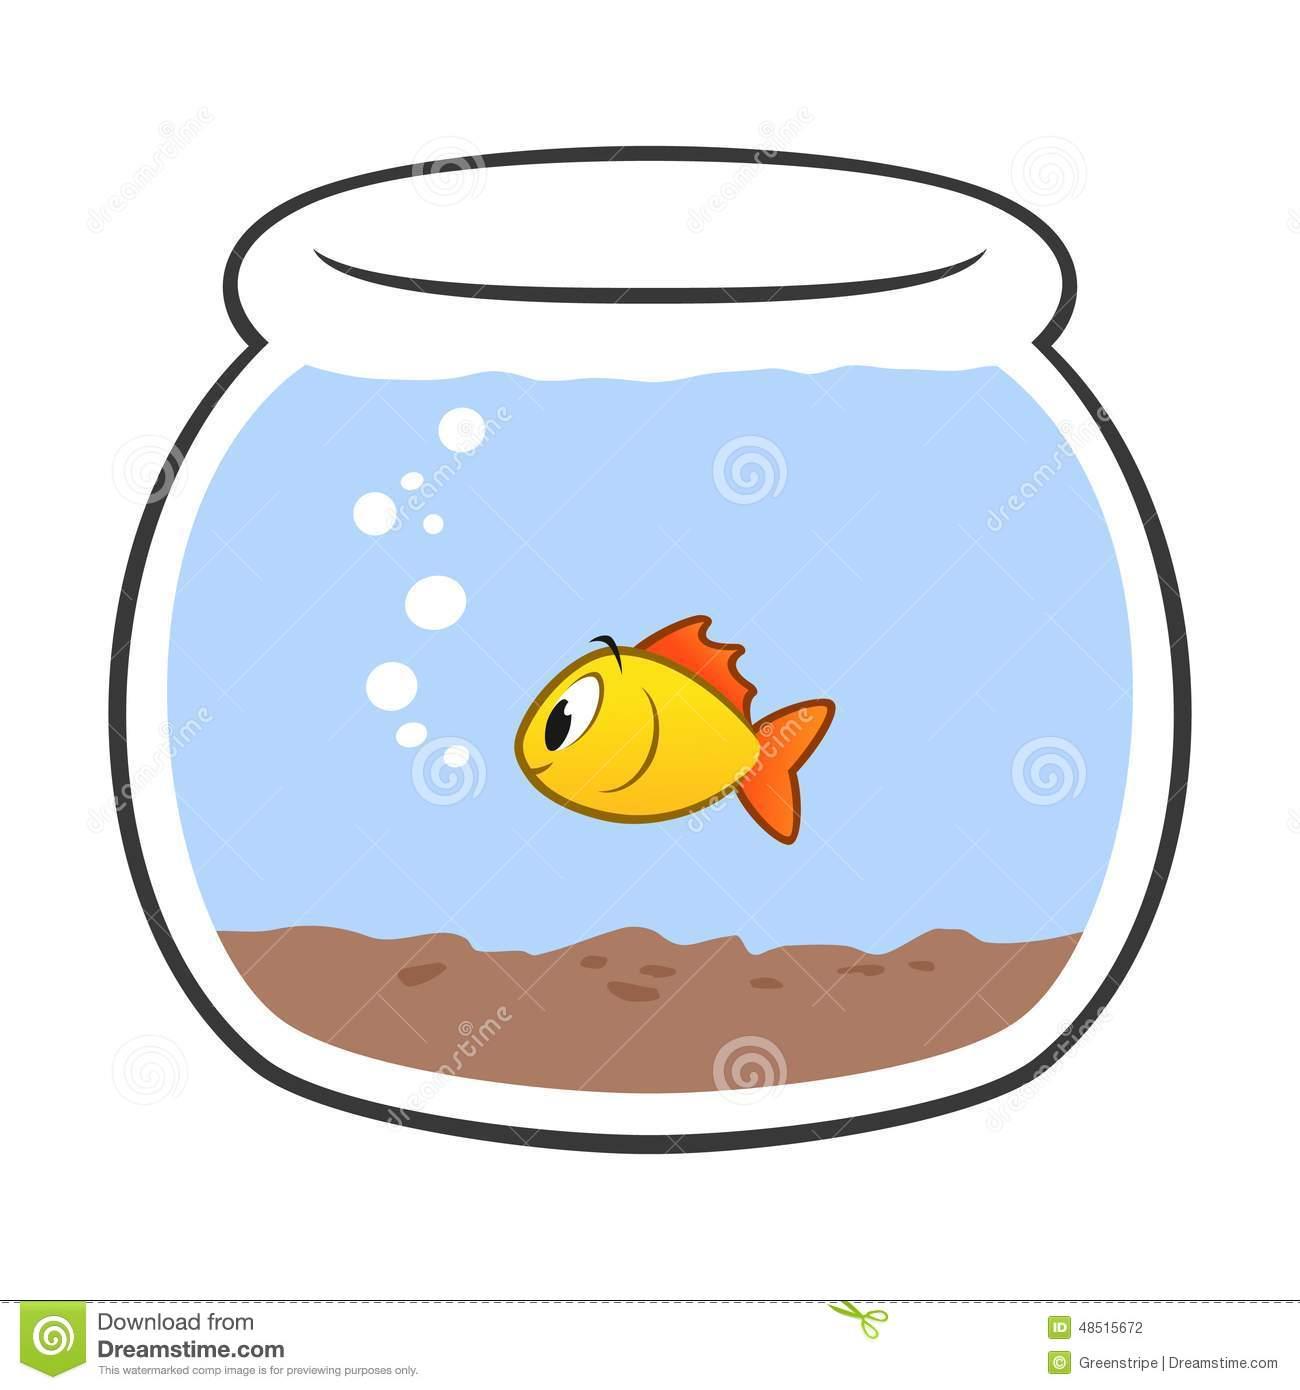 1300x1390 Fishbowl Clipart Goldfish Fish Bowl Clip Art Royalty Free Stock